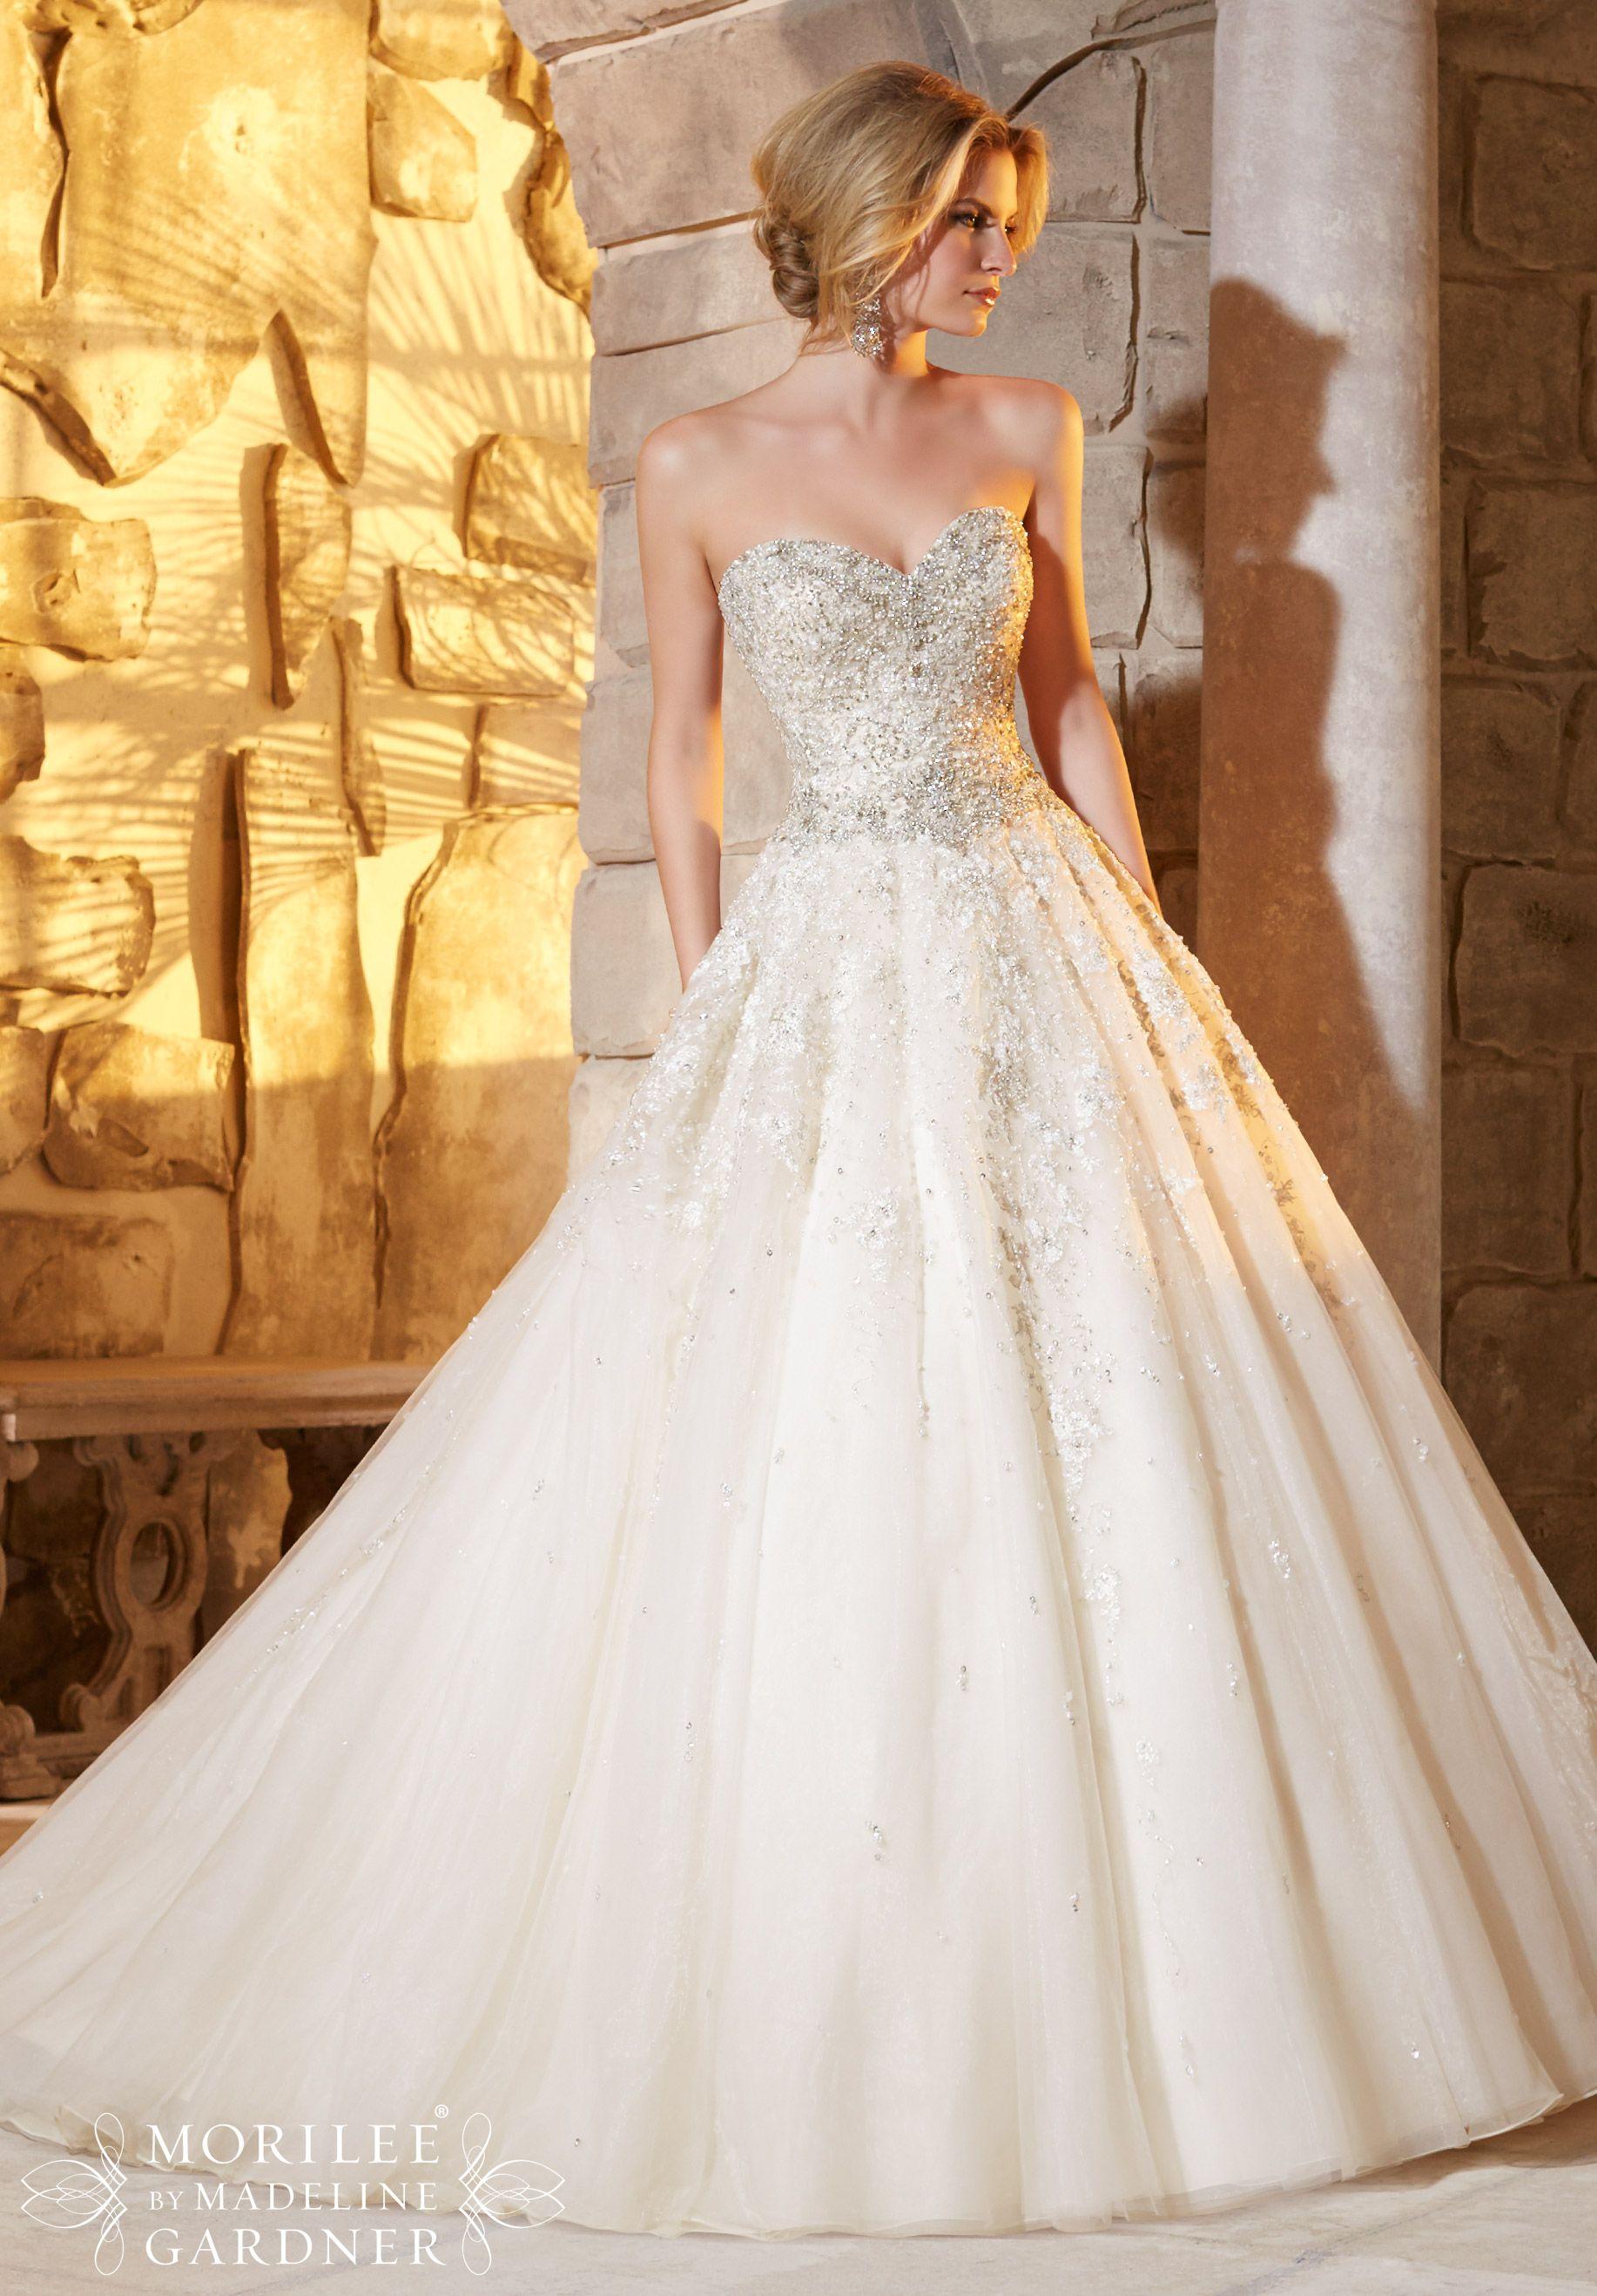 wedding dress 2791 and diamante beading decorates the